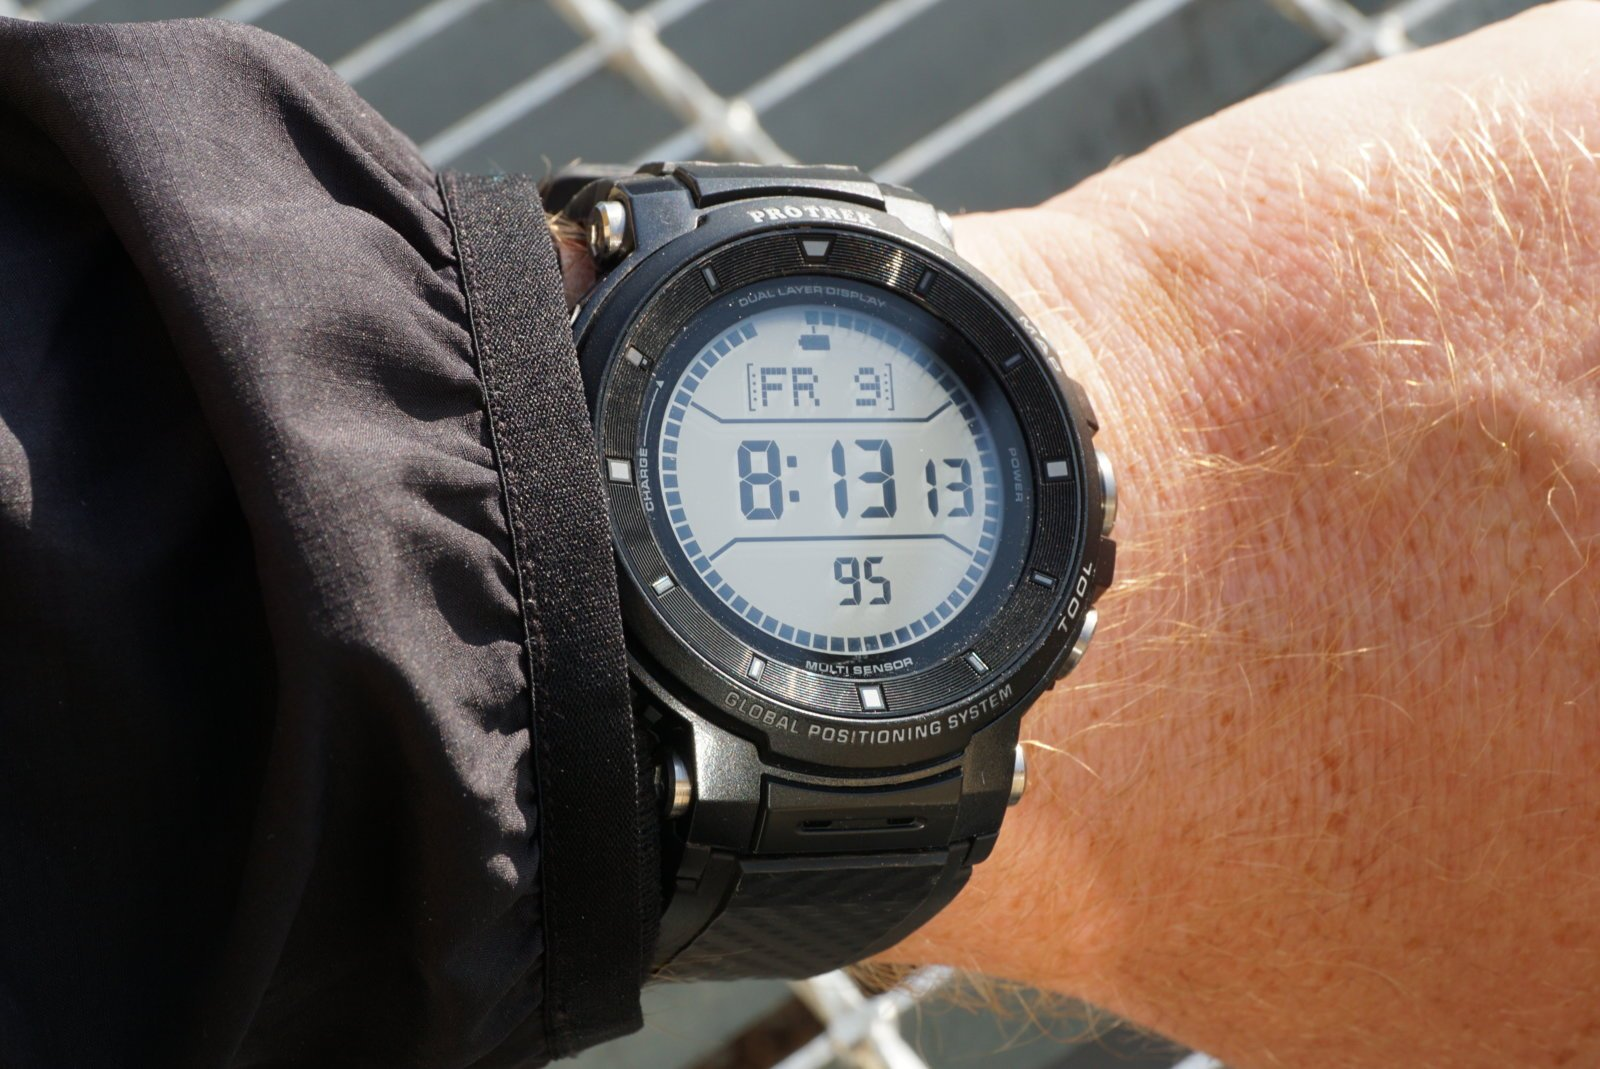 ABD8B3FC-376E-43B8-A3B4-A19372DCB756.